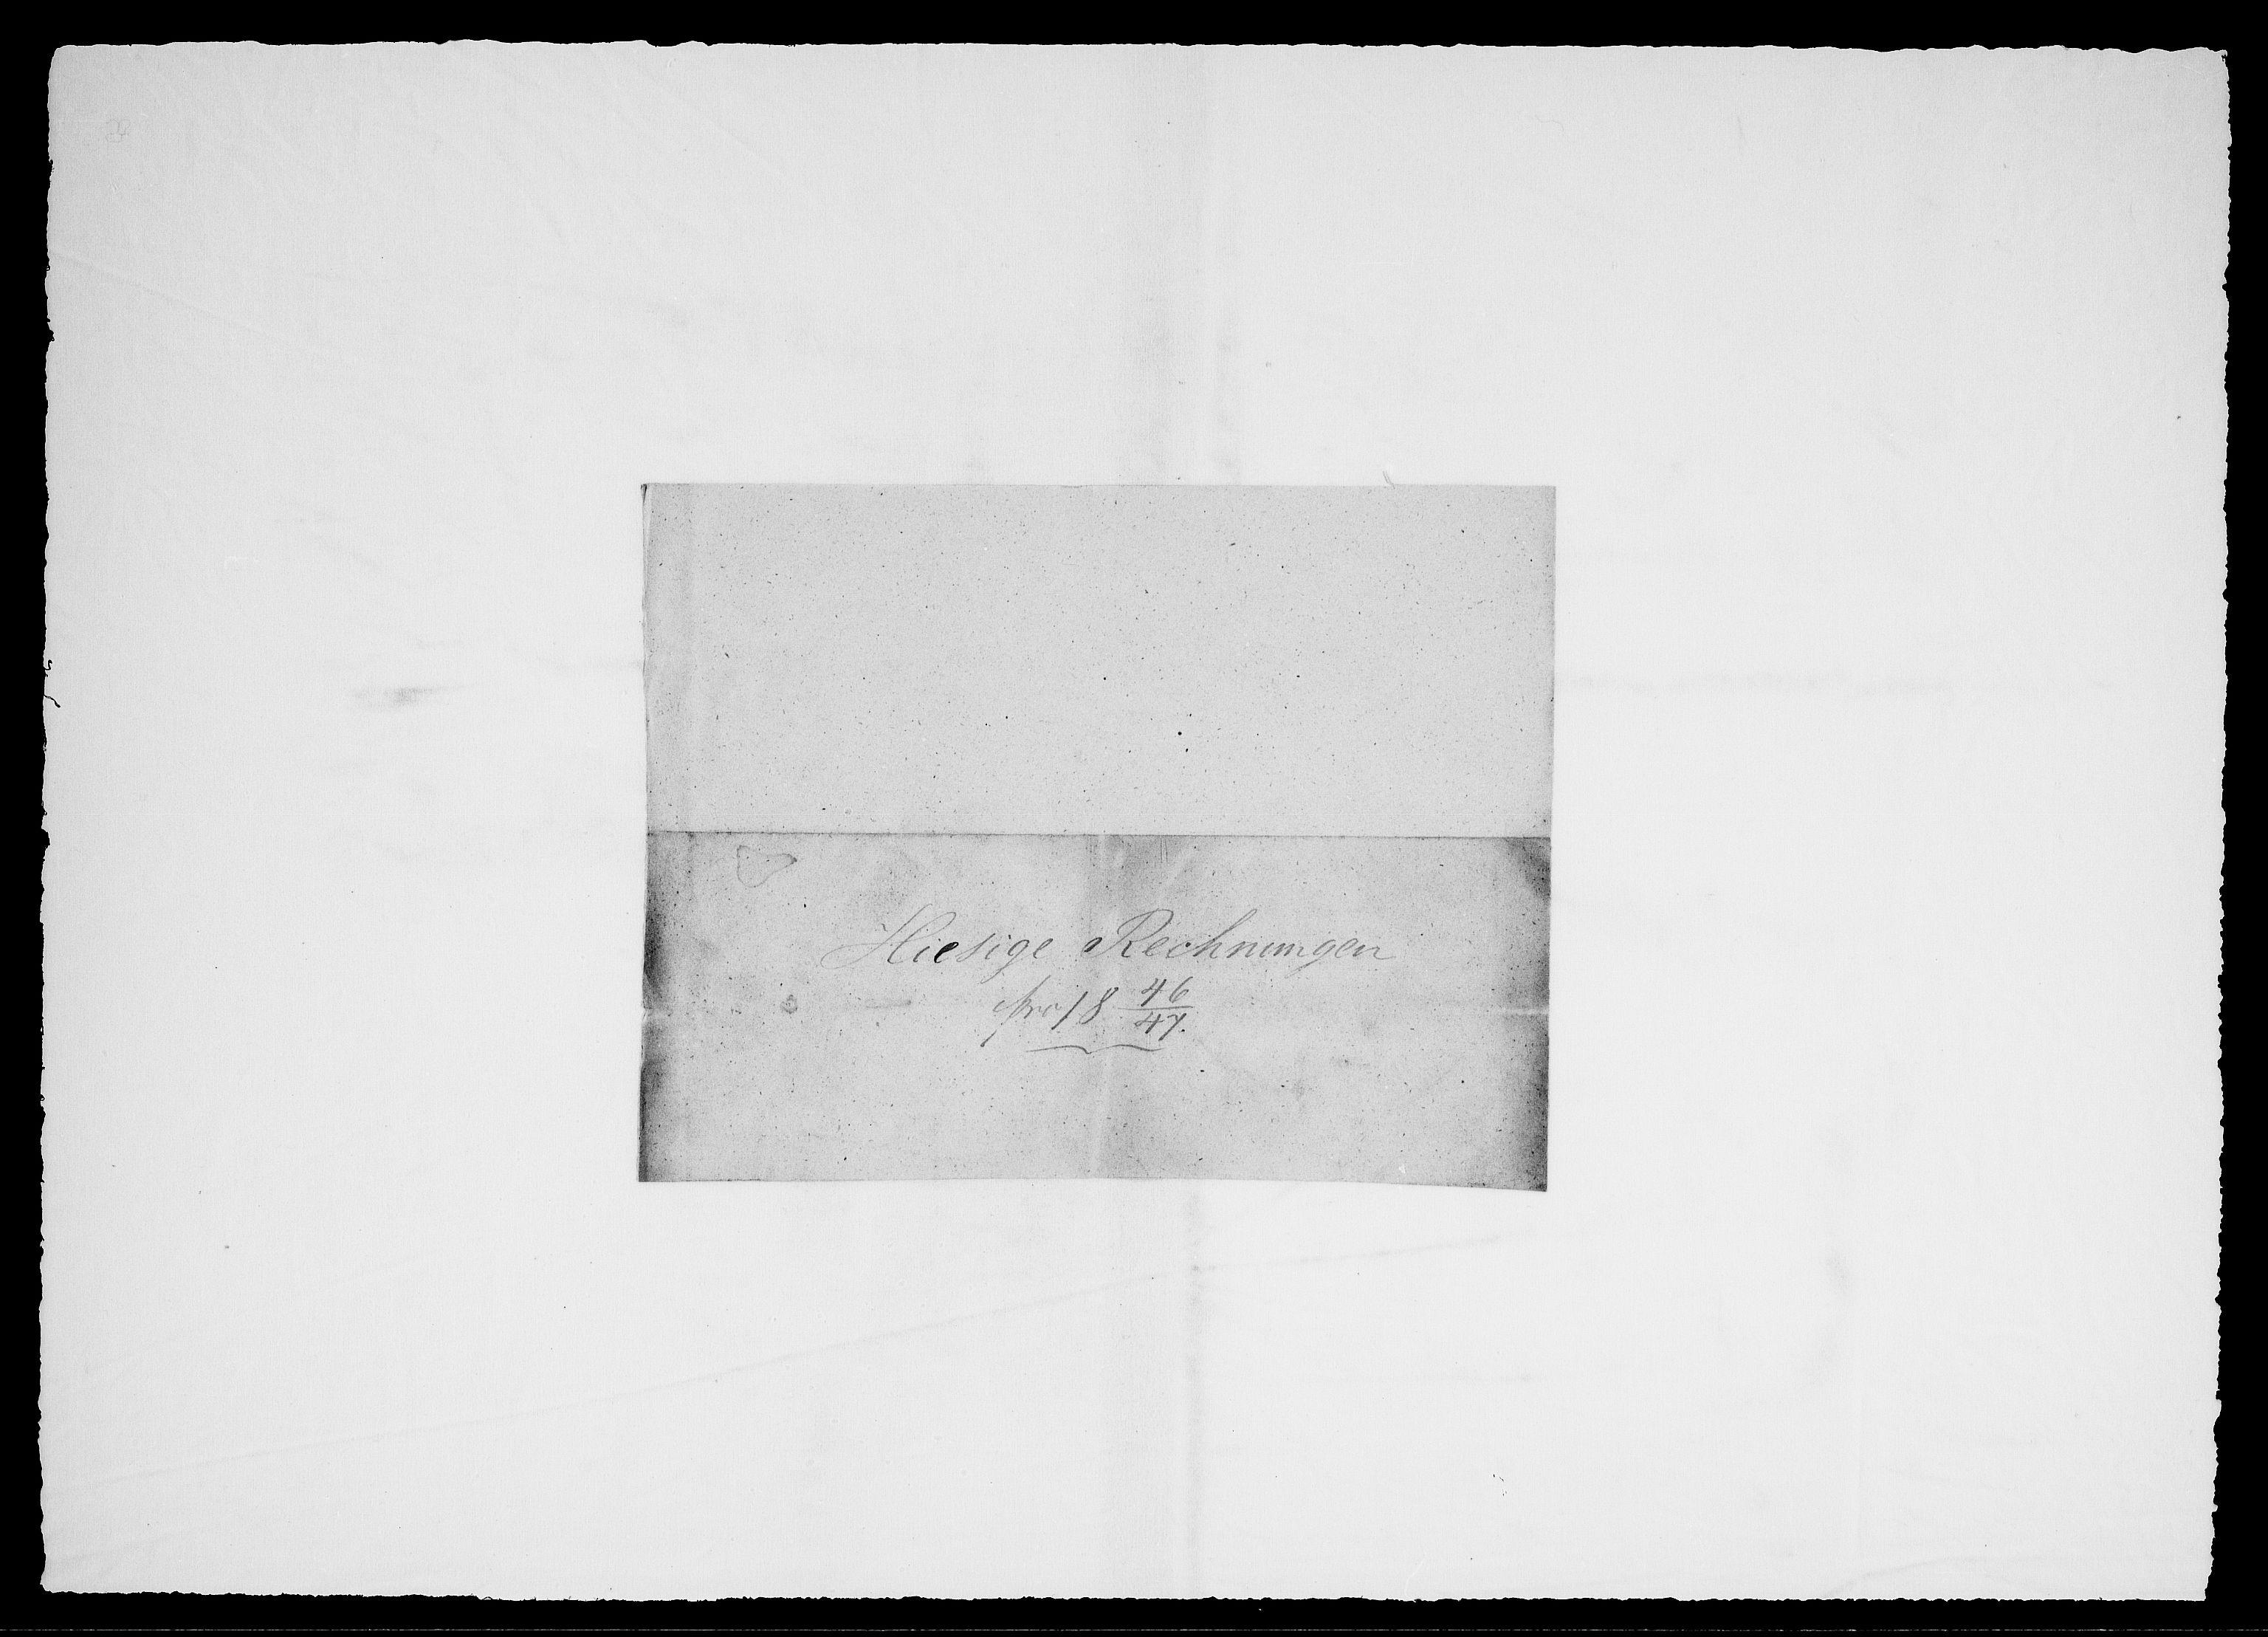 RA, Modums Blaafarveværk, G/Gd/Gdc/L0221, 1846-1849, s. 2